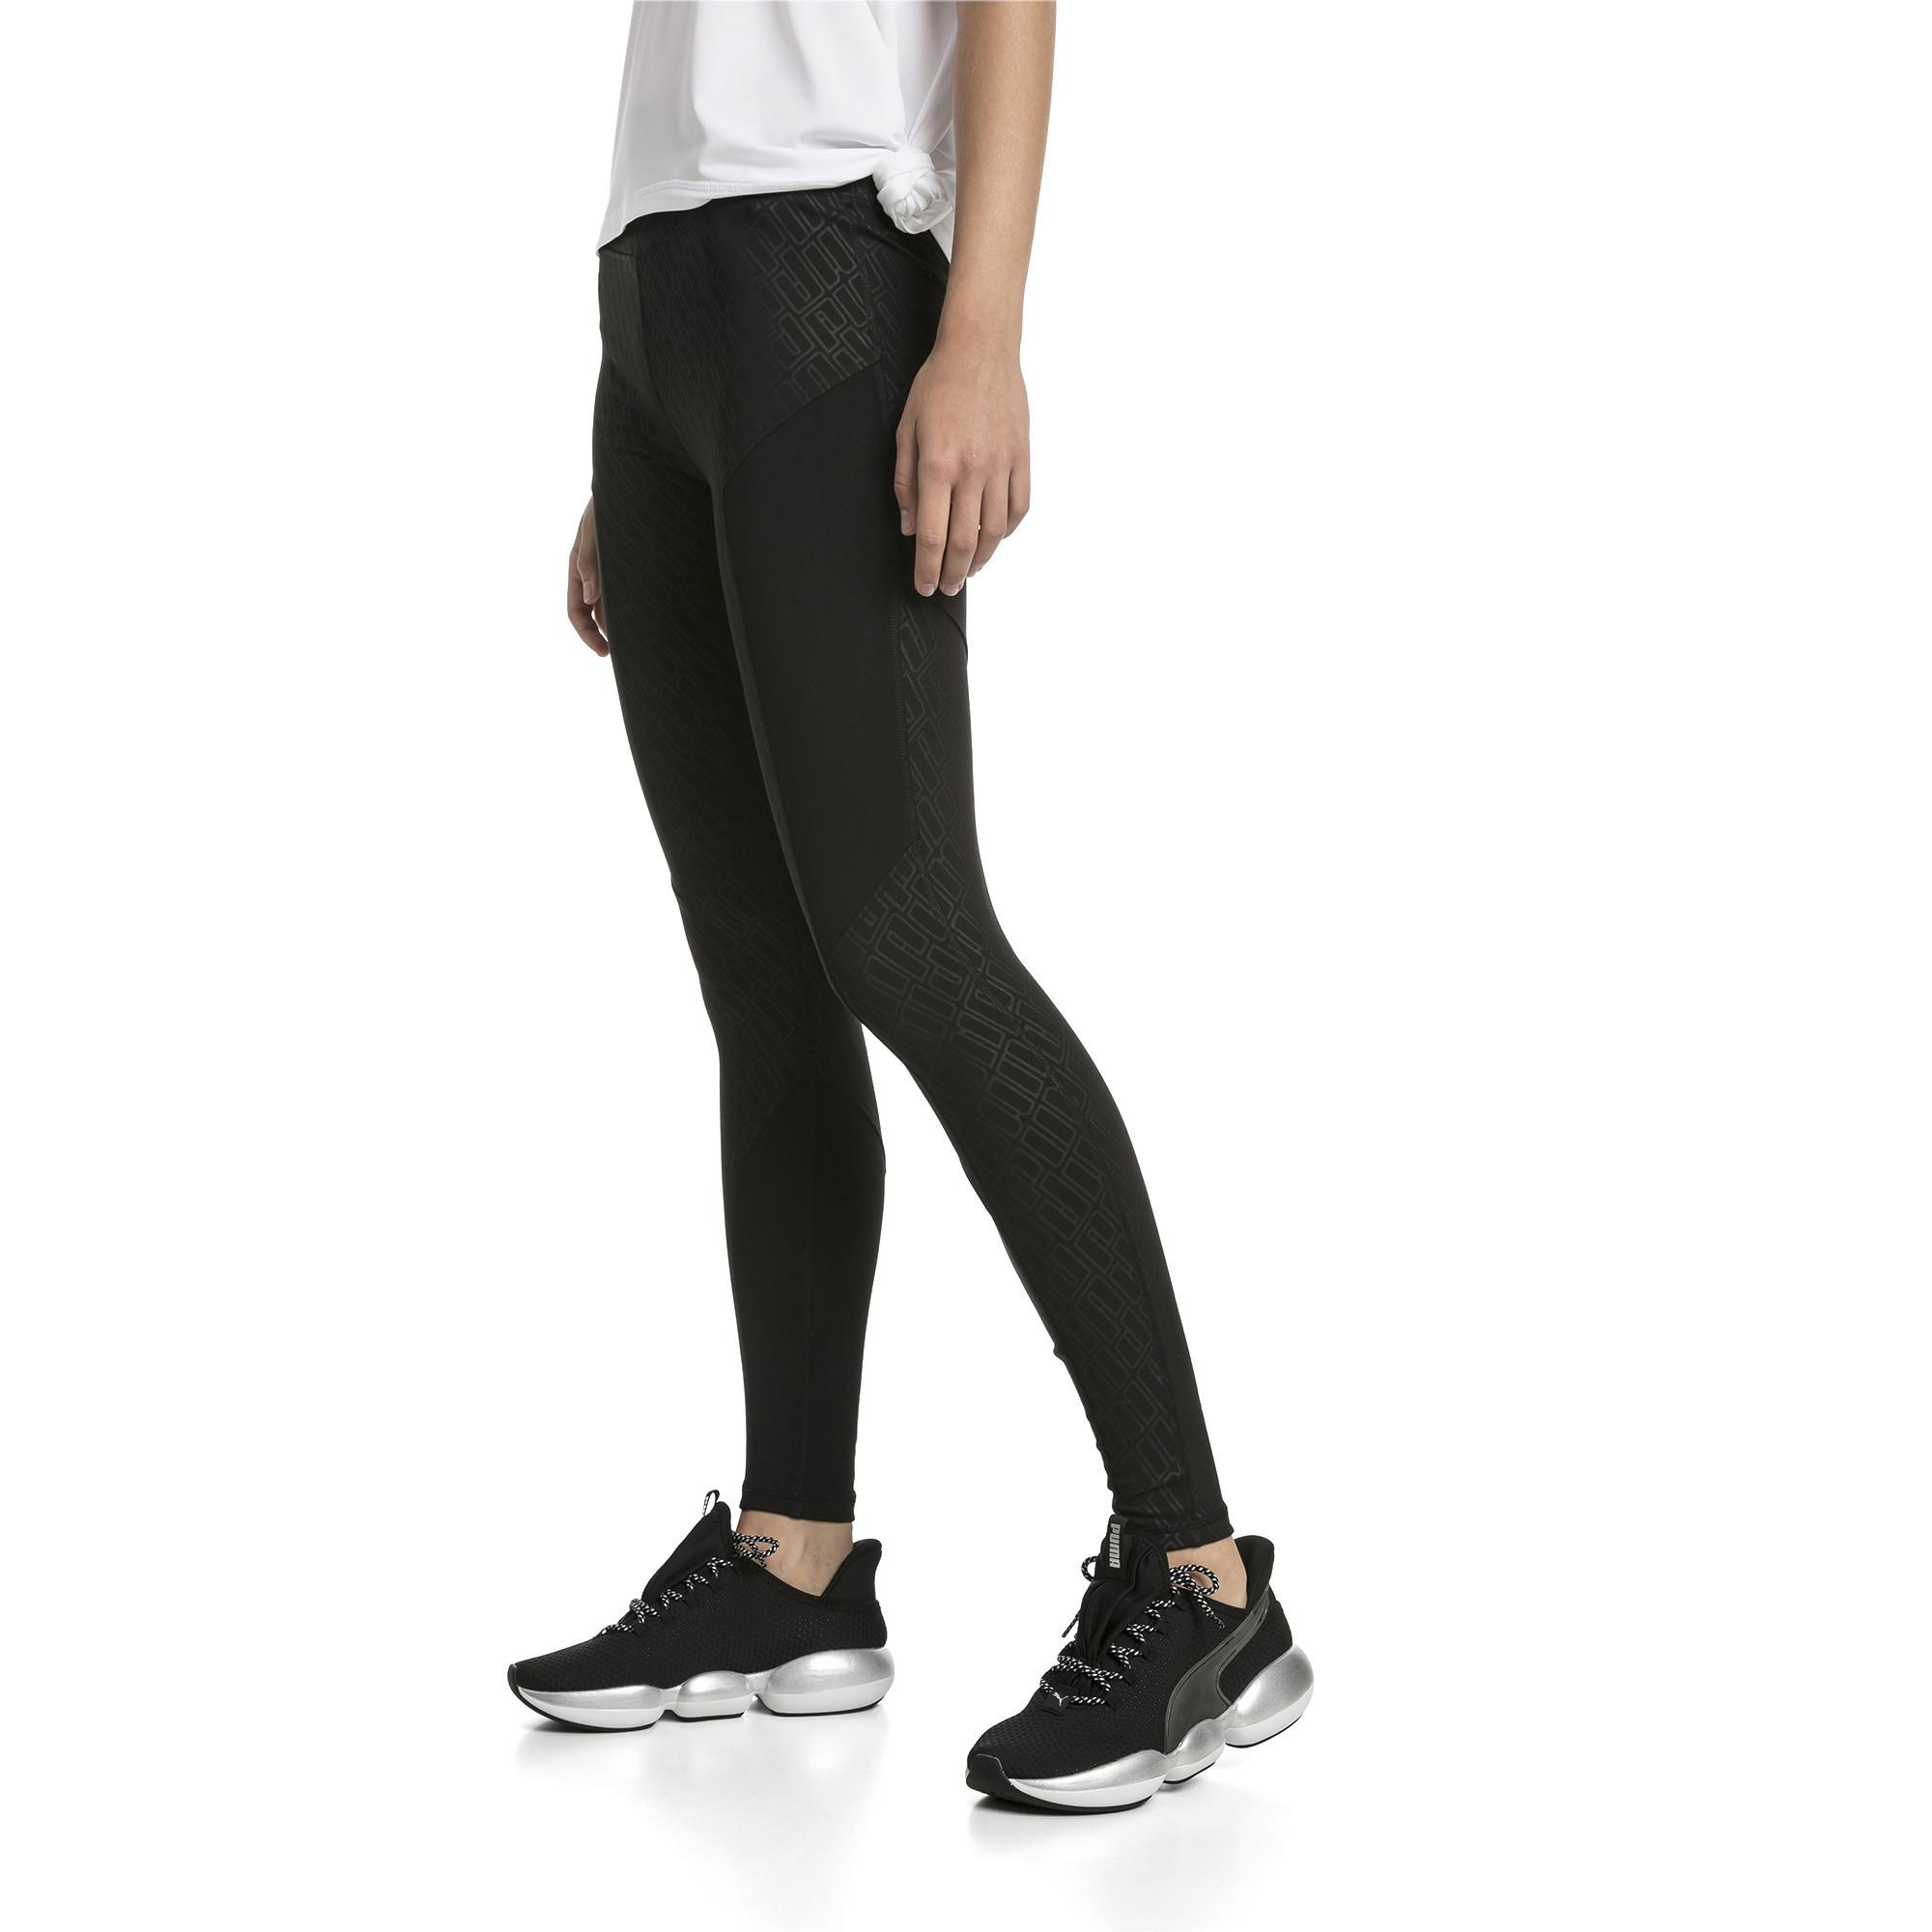 05d149de86 PUMA Bold Graphic Women's Leggings 517408